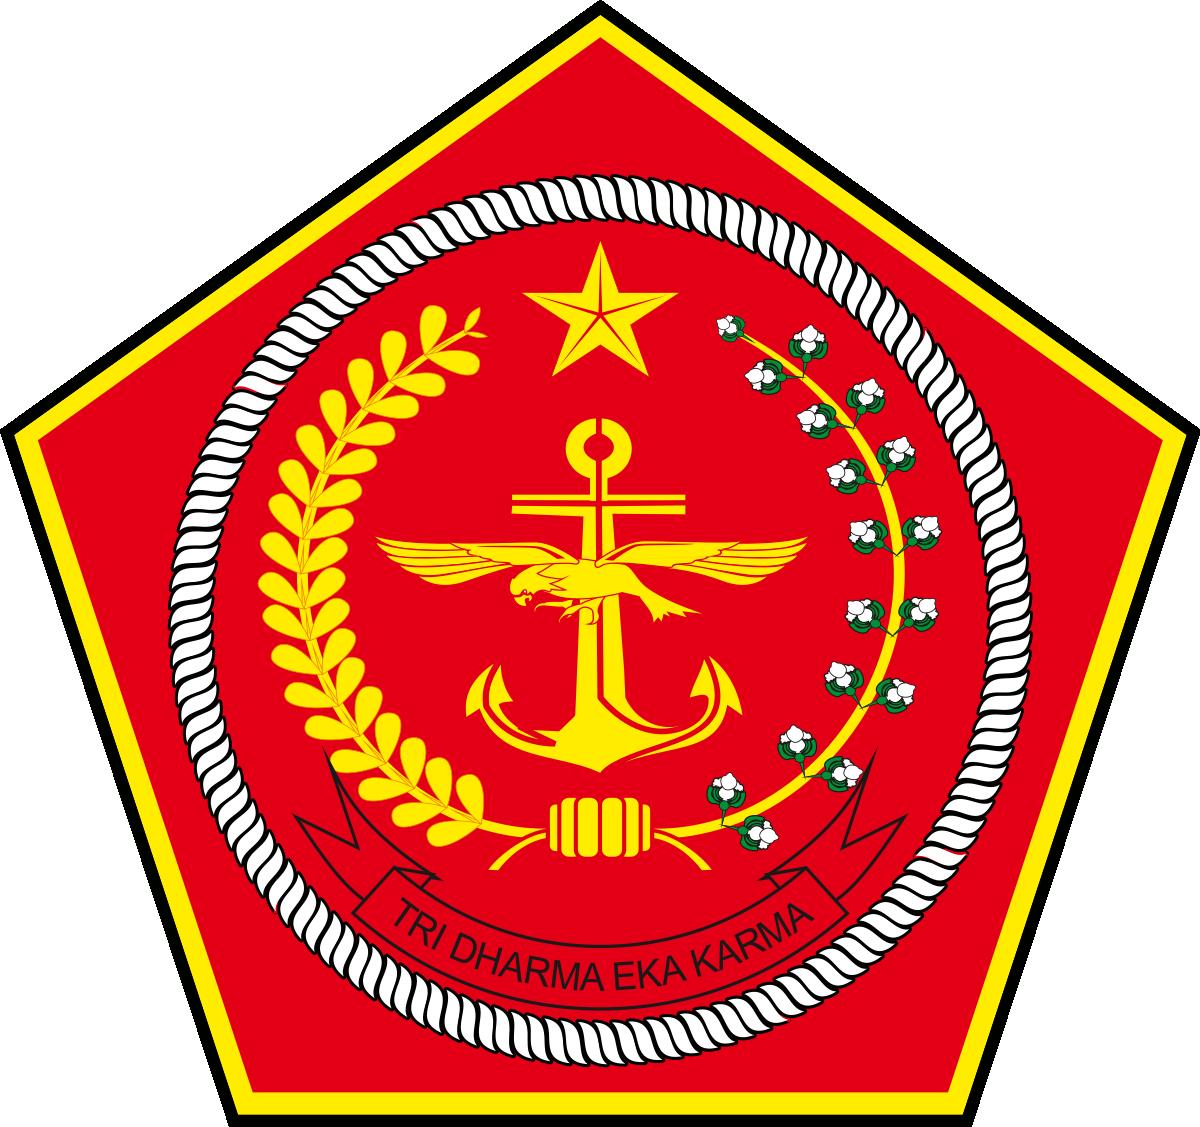 Pendaftaran Perwira Prajurit Karier TNI TA 2021